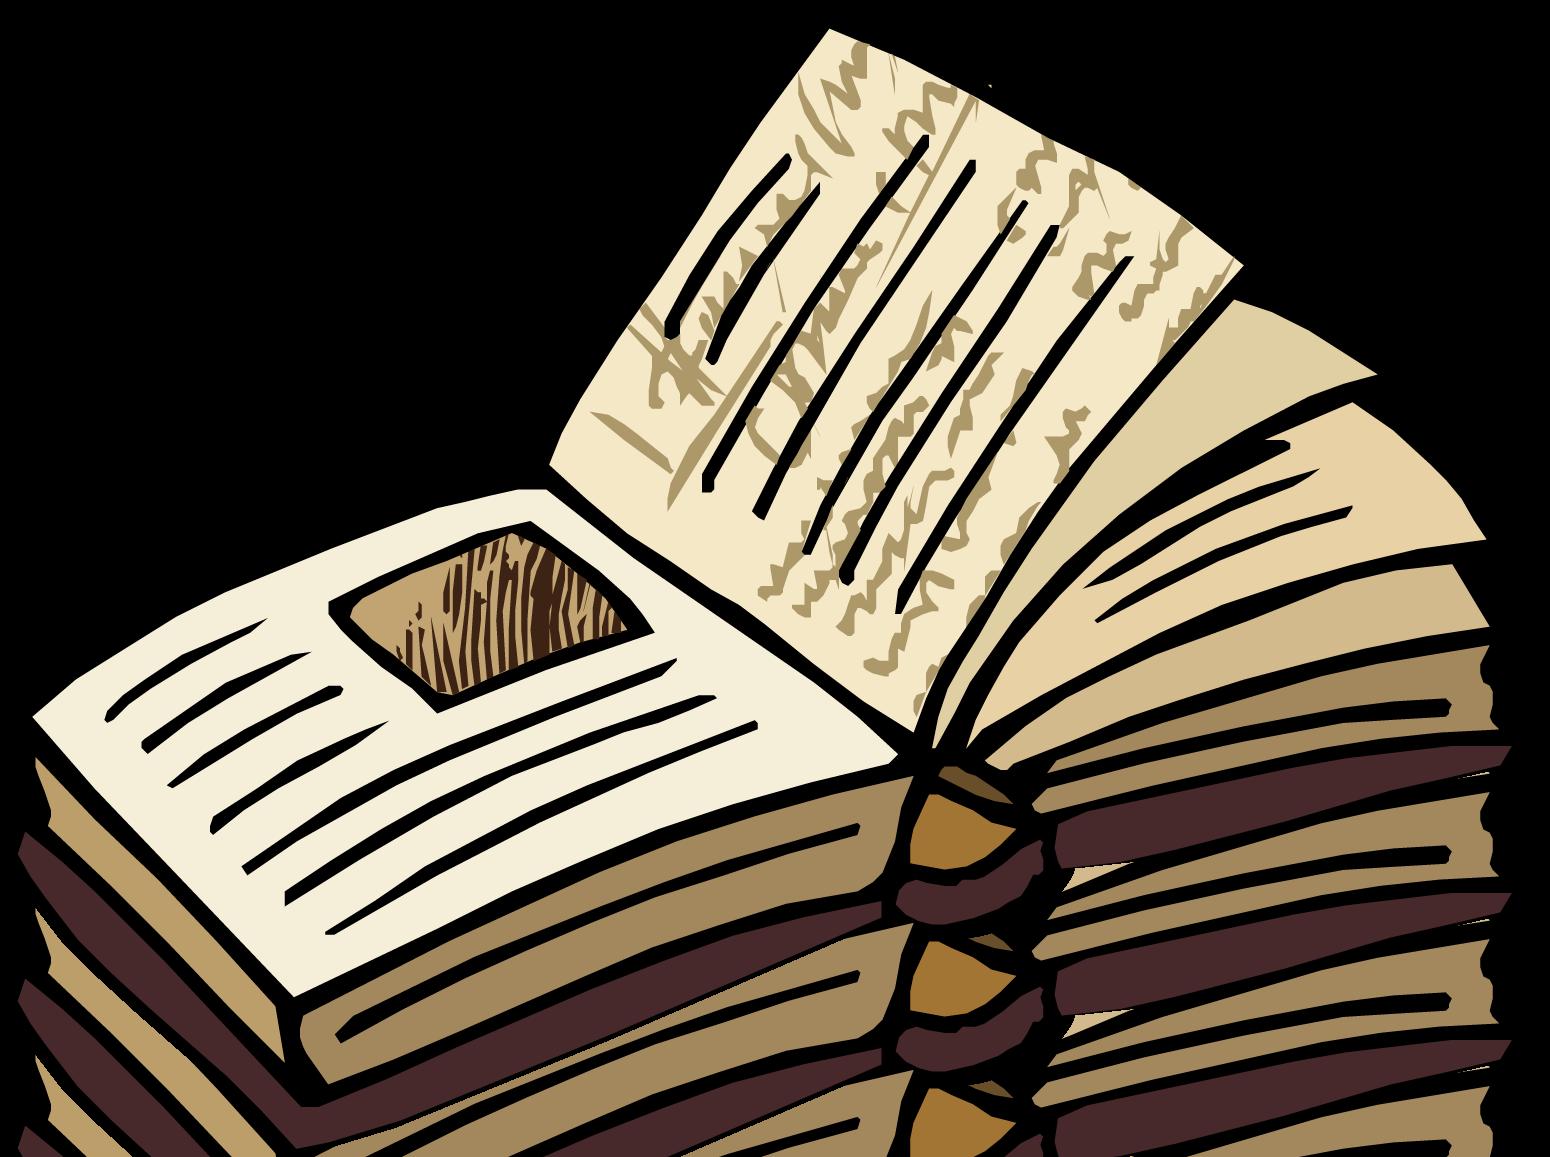 Classic book clipart svg free download Hemlock Falls Mysteries | Mysterious Eats svg free download